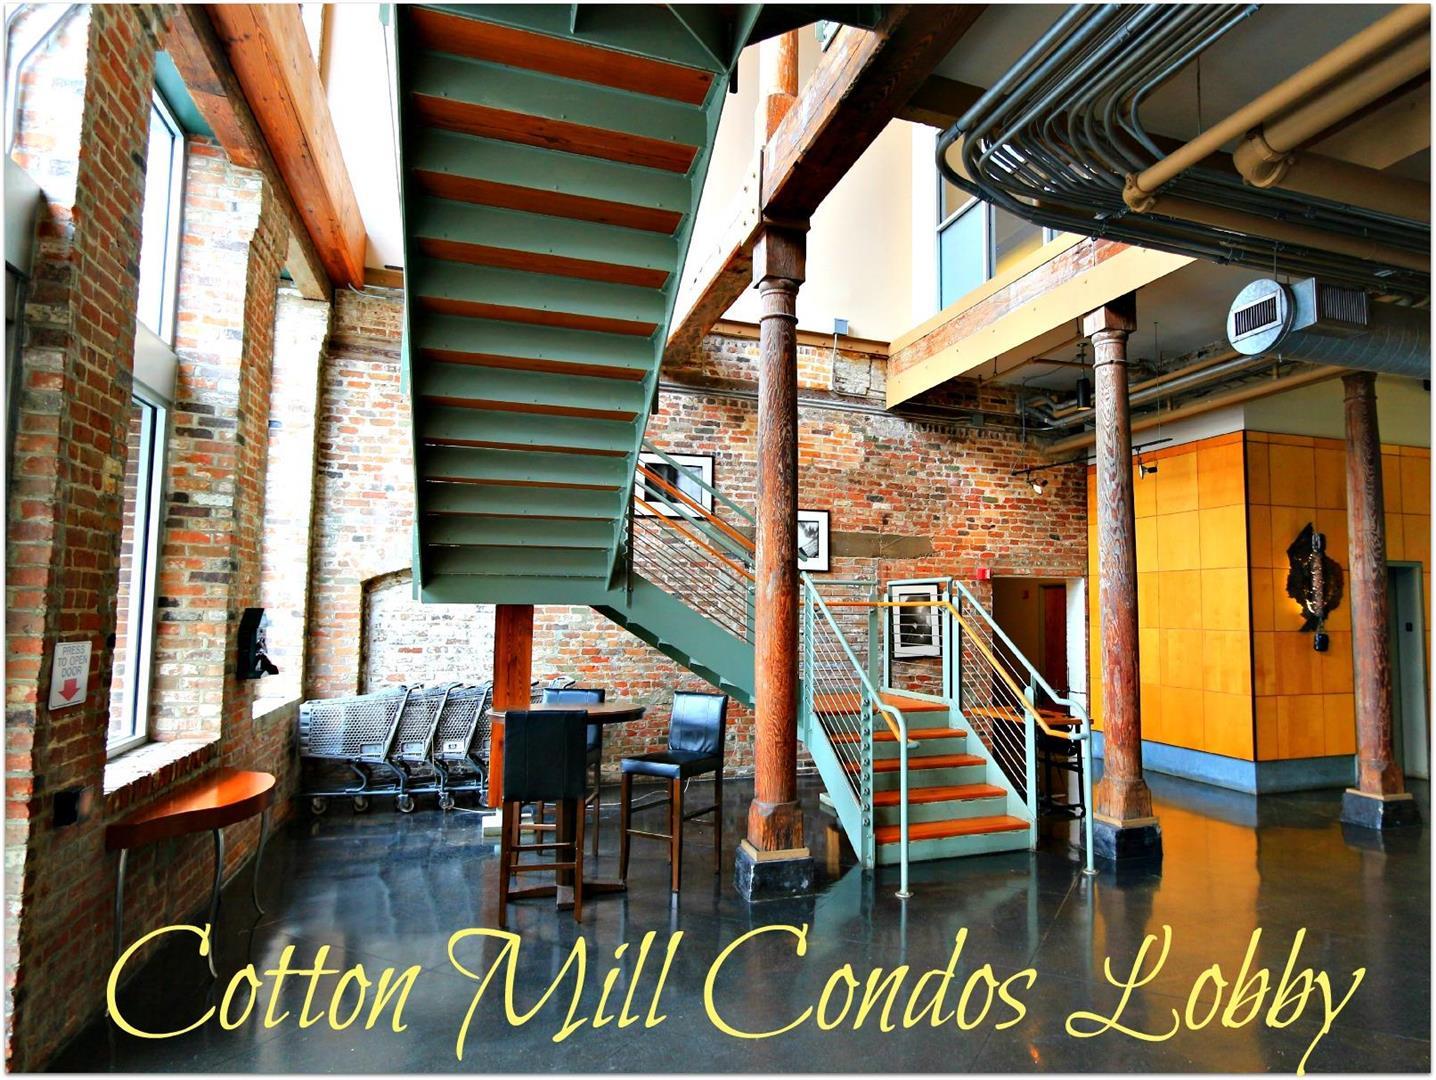 CottonMillCondosLobby.jpg